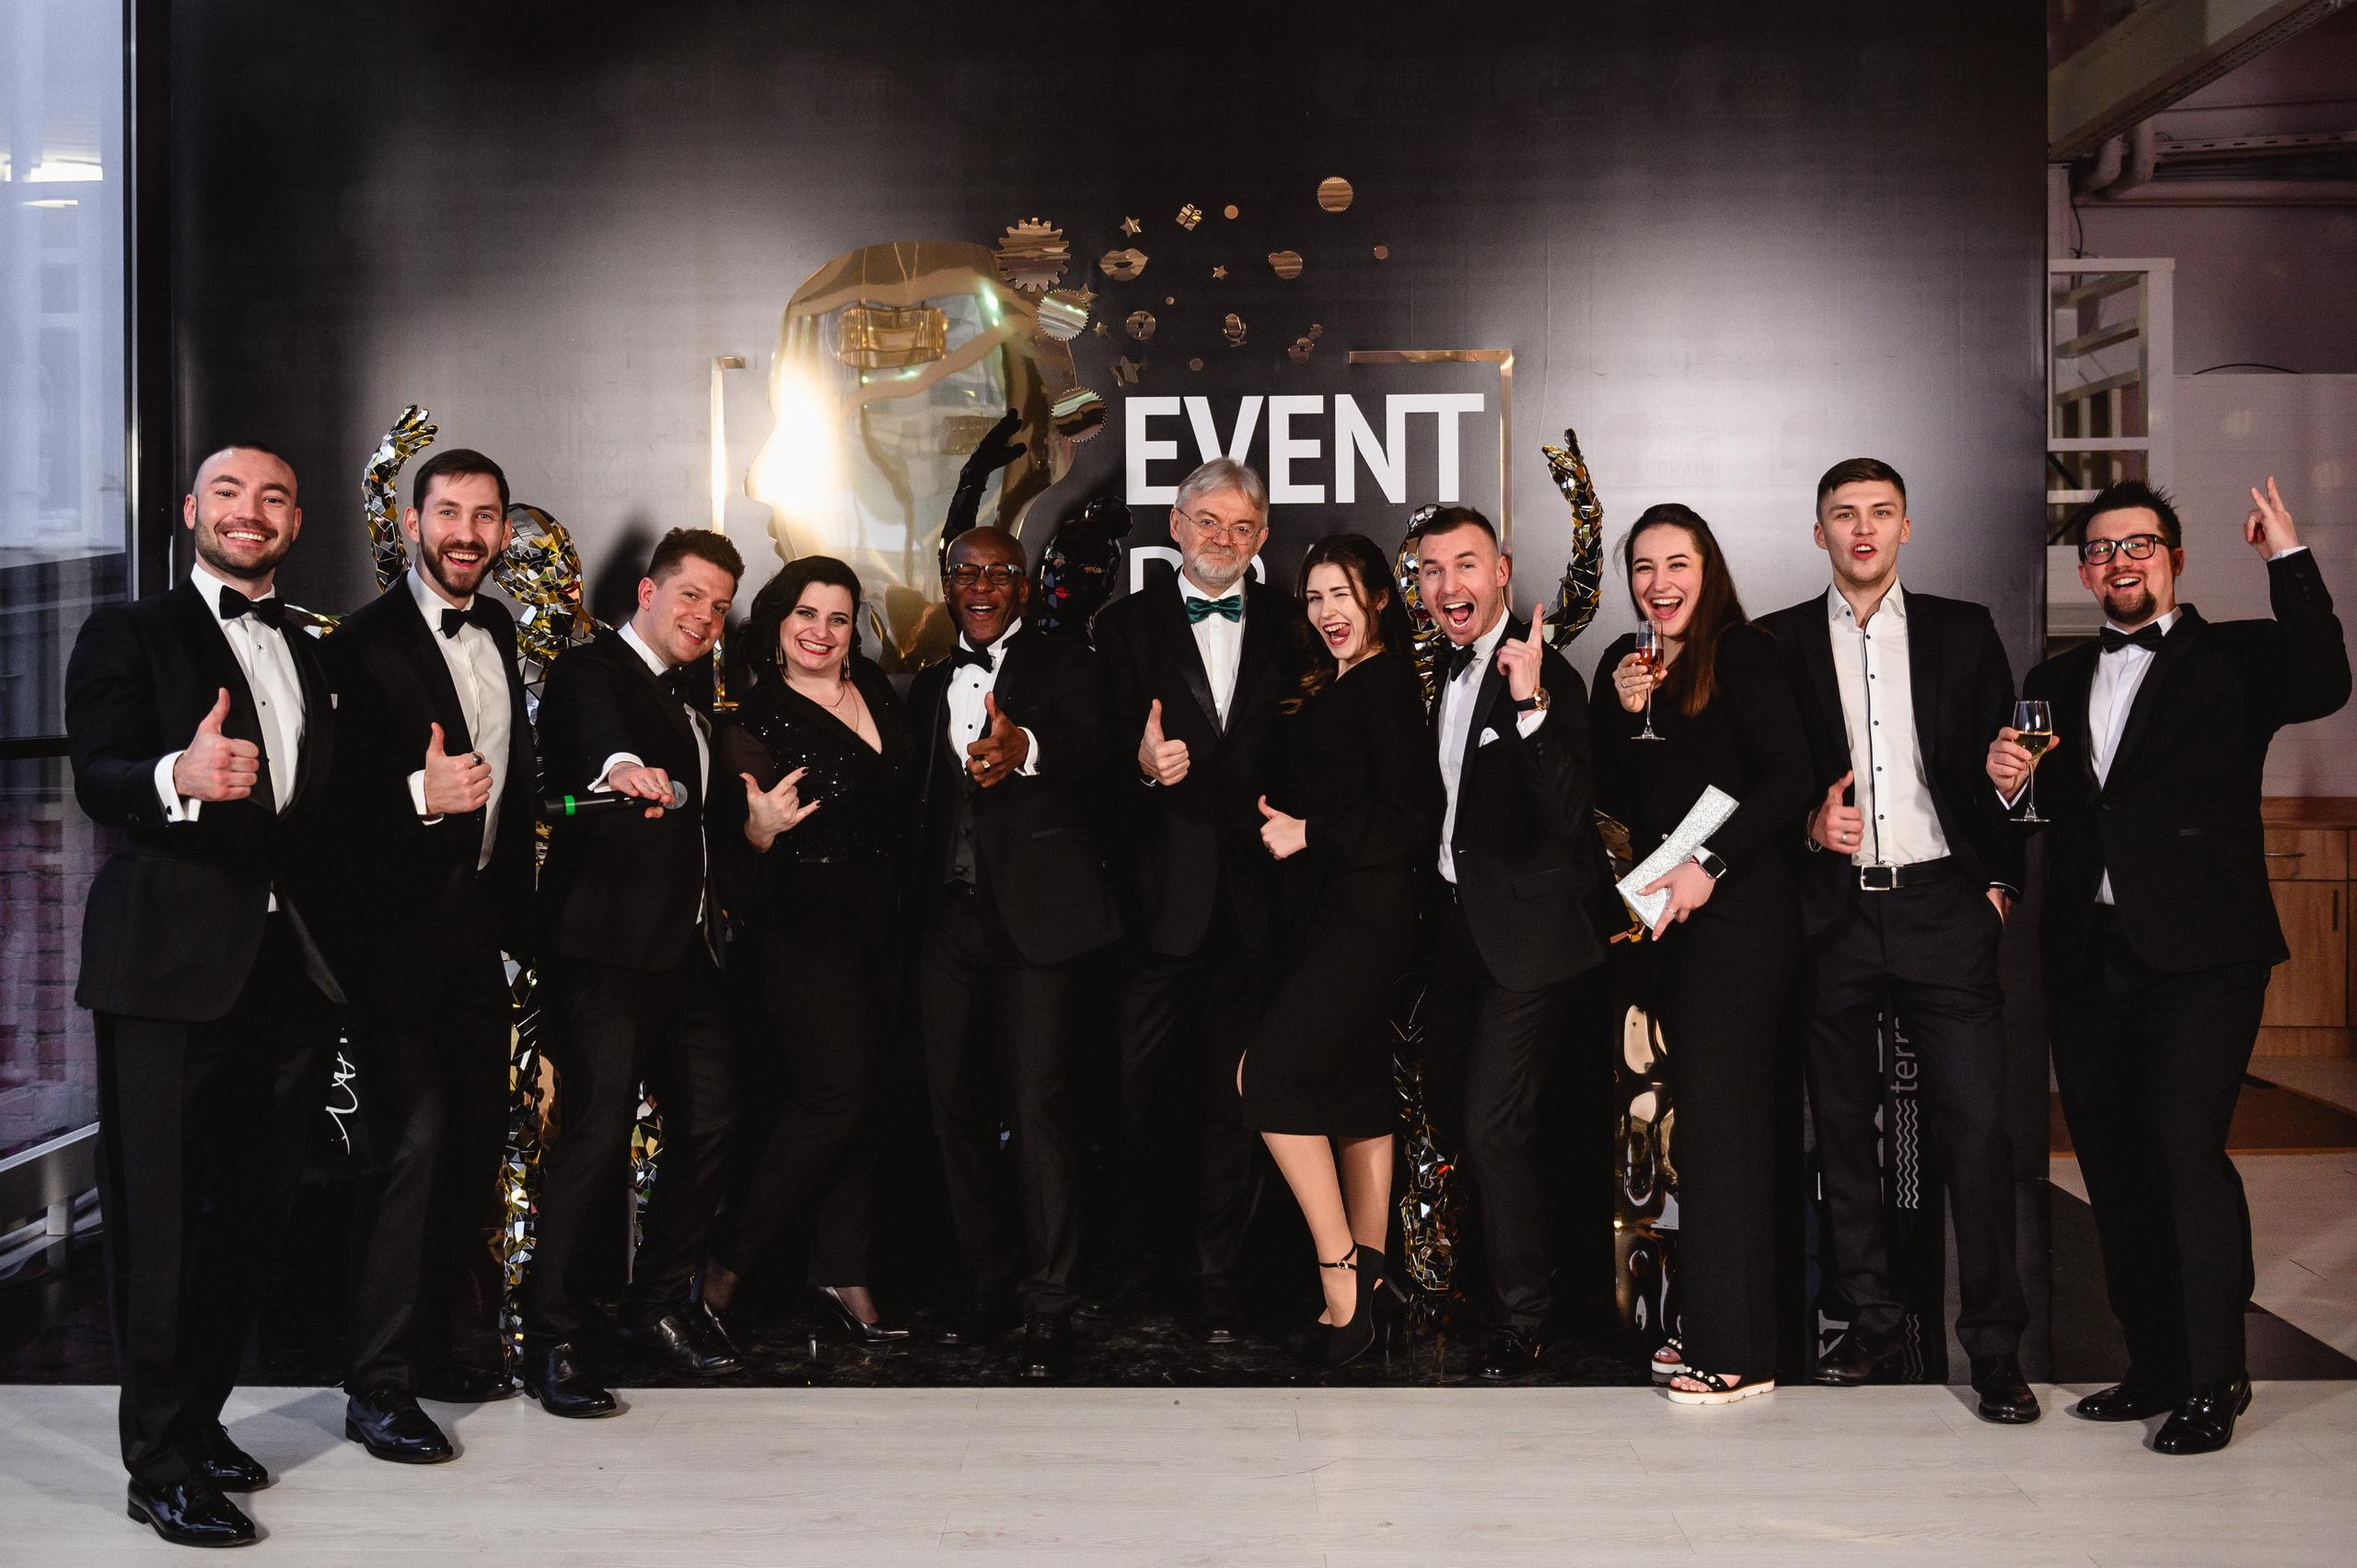 EVENTBRAIN 2020 Императорская команда